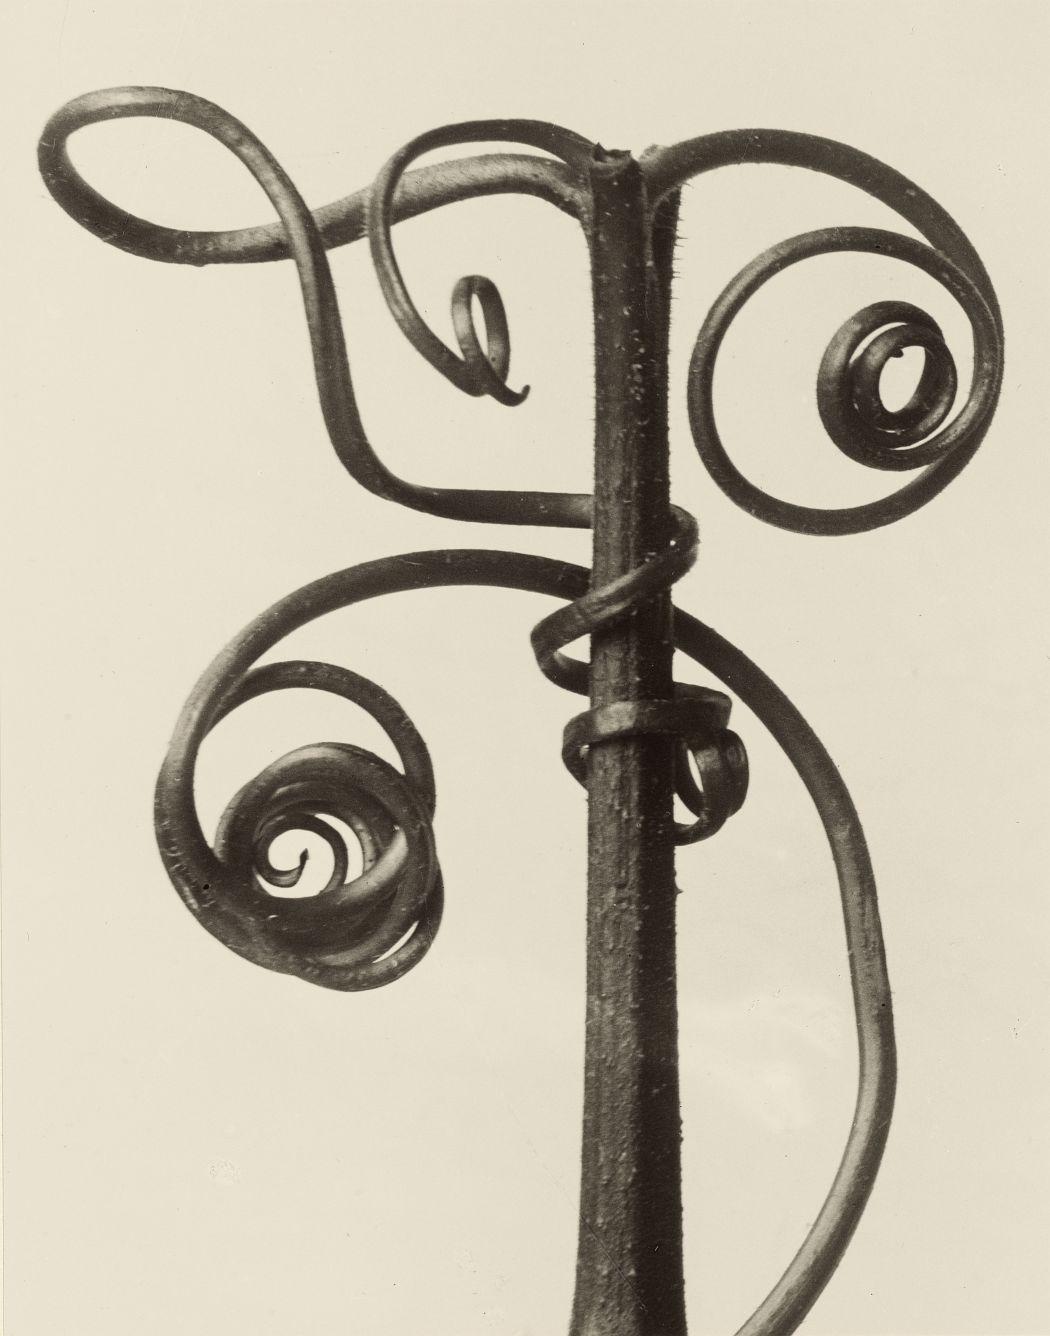 "Karl Blossfeldt (1865–1932) Cucurbita. Kürbisranke, 4 mal vergrößert aus dem Portfolio ""Karl Blossfeldt. 12 Fotografien"" (Galerie Wilde, Köln 1975), 1900-1928 (Abzug 1975), Silbergelatineabzug, 19,5 x 24,6 cm © Kunstpalast, Düsseldorf"